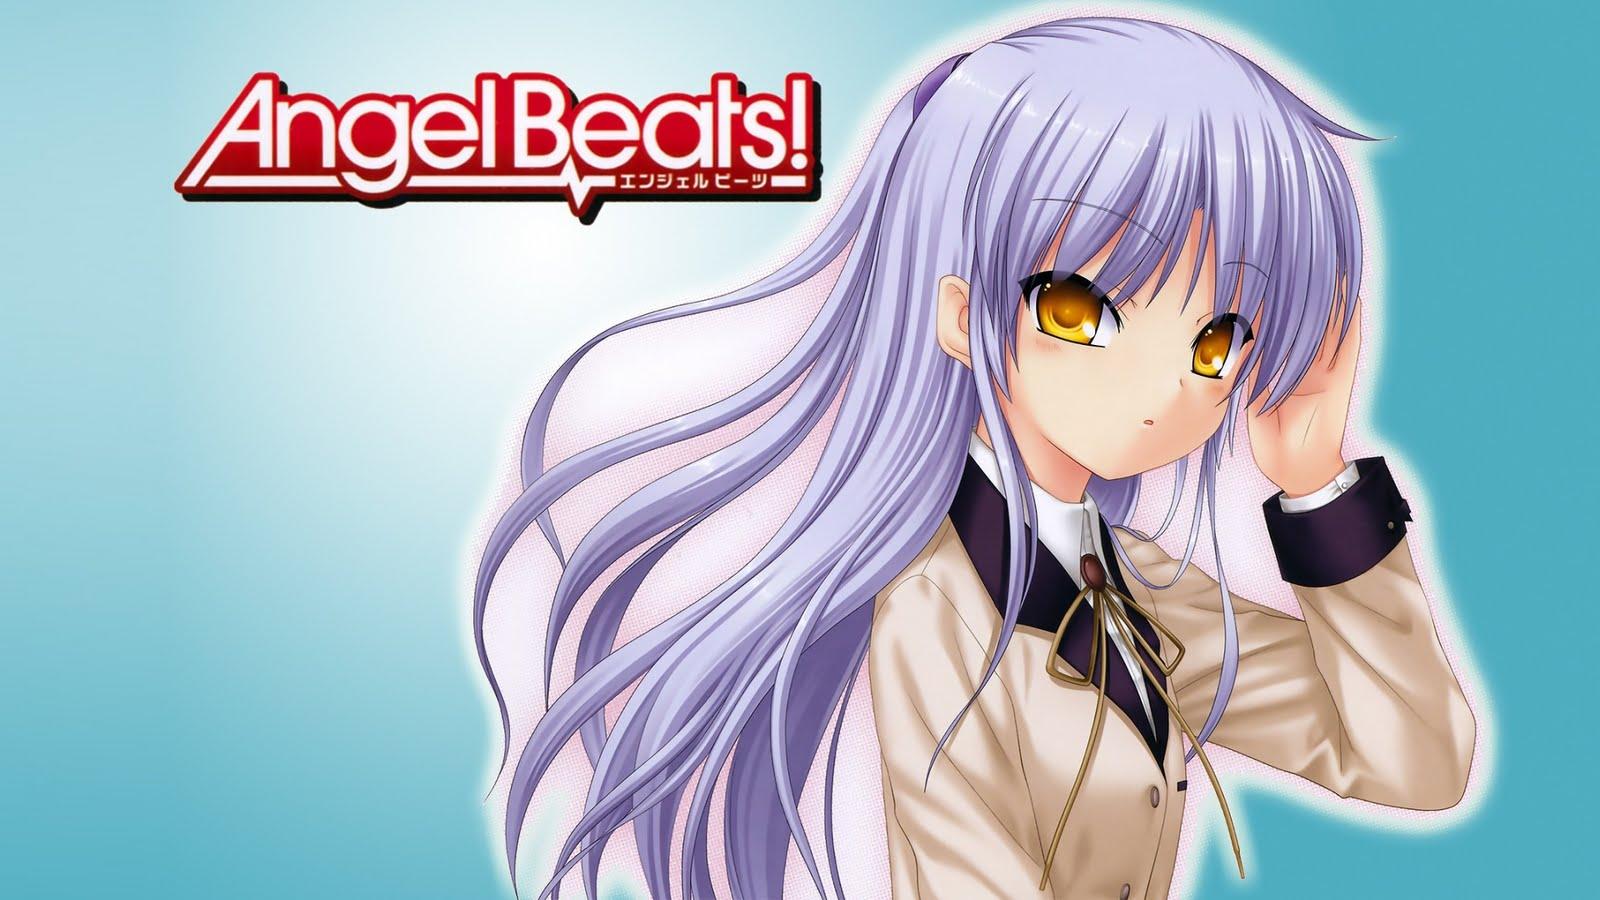 http://3.bp.blogspot.com/_4cYAM3u-vvg/S_uOAoFfL8I/AAAAAAAAGks/3FvT6rBJ3pI/s1600/Konachan.com+-+75646+angel_beats%21+tachibana_kanade+tenshi.jpg